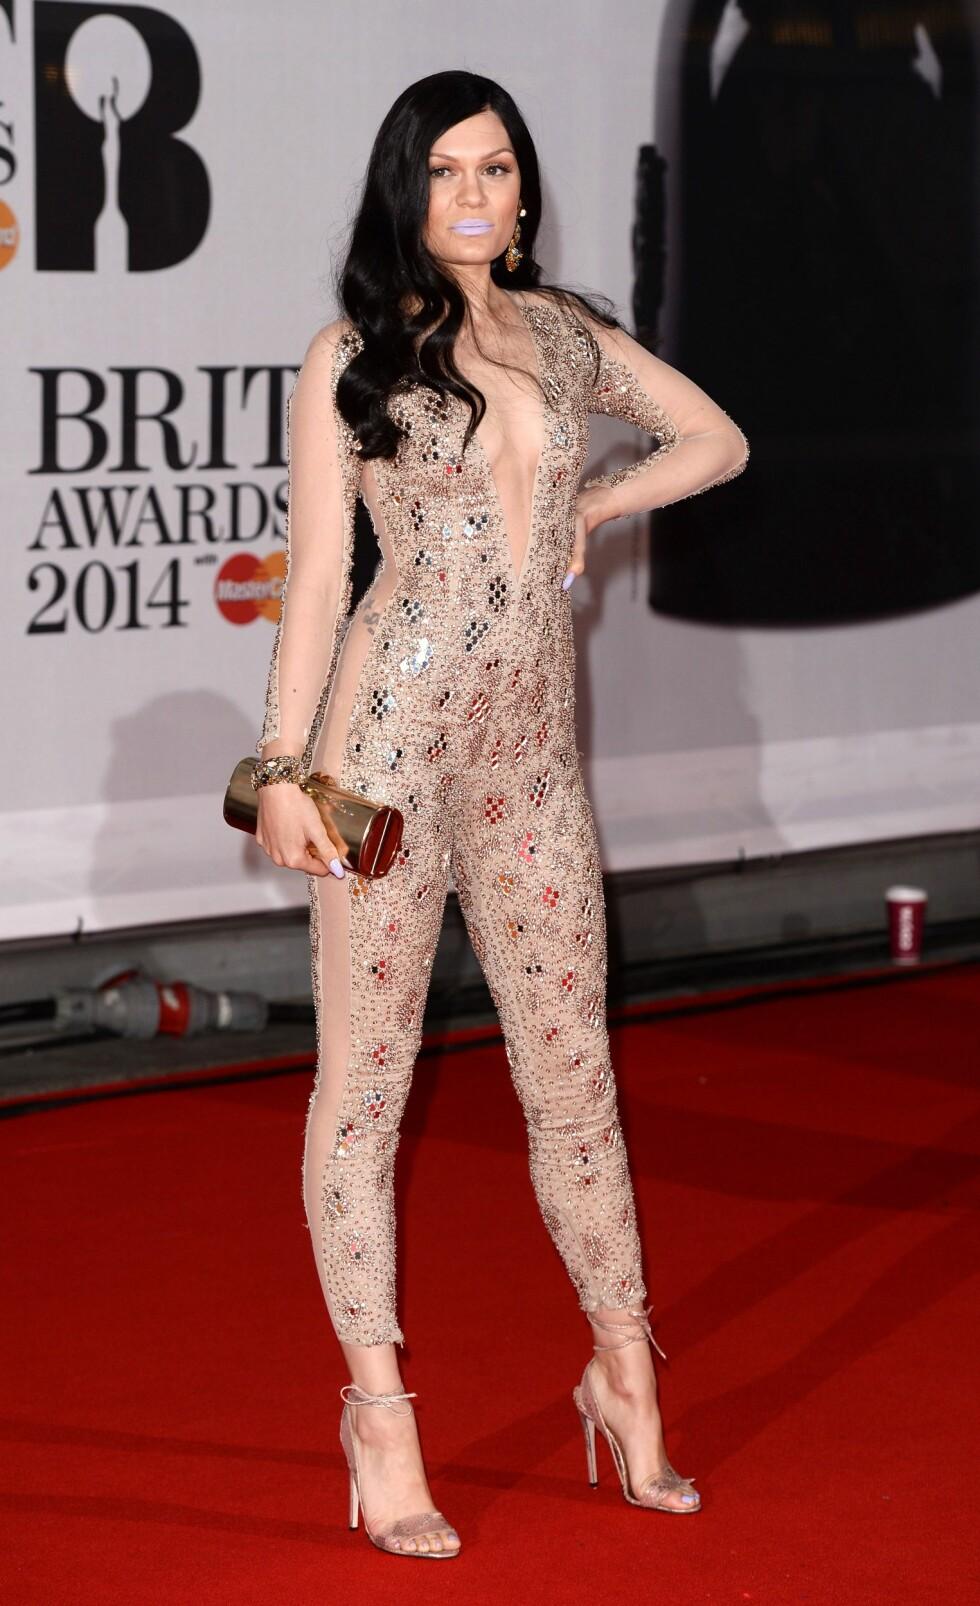 Artisten og låtskriveren Jessie J (25). Foto: REX/David Fisher/All Over Press